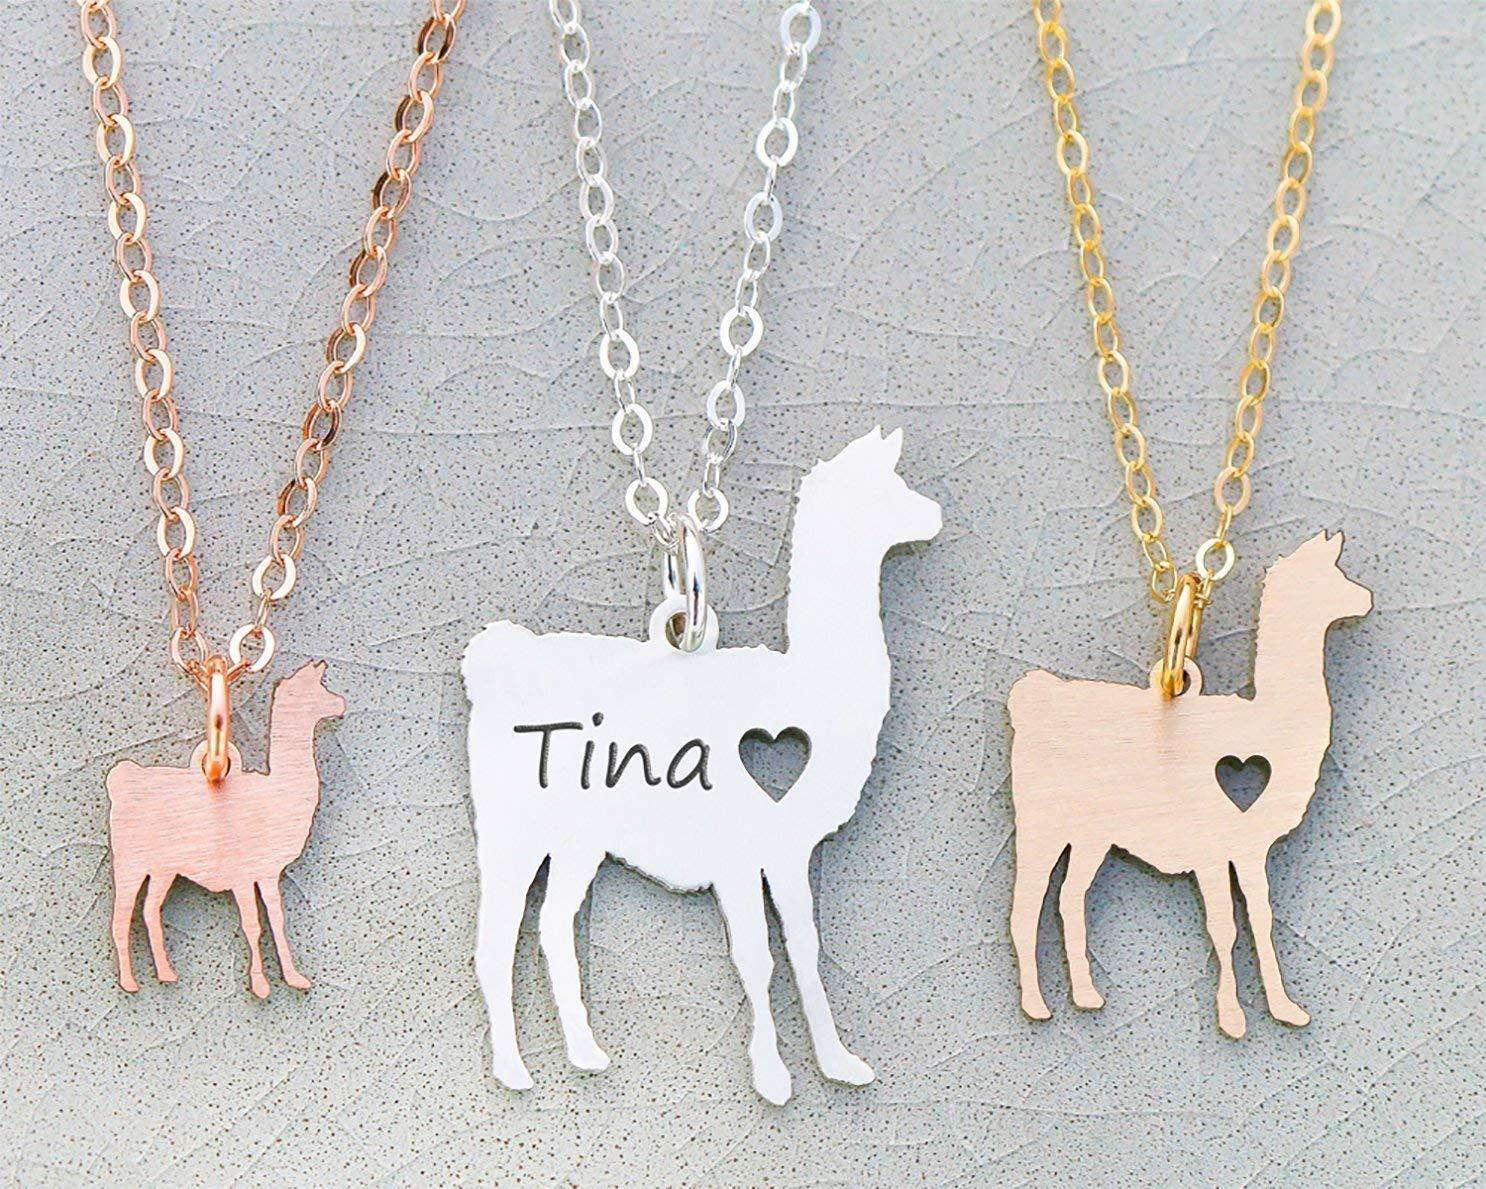 Animal Jewelry Friendship Necklace Llama Charm Necklaces Alpaca Necklace No Drama Llama Llama Lover Llama Gift Stamped Llama Necklace